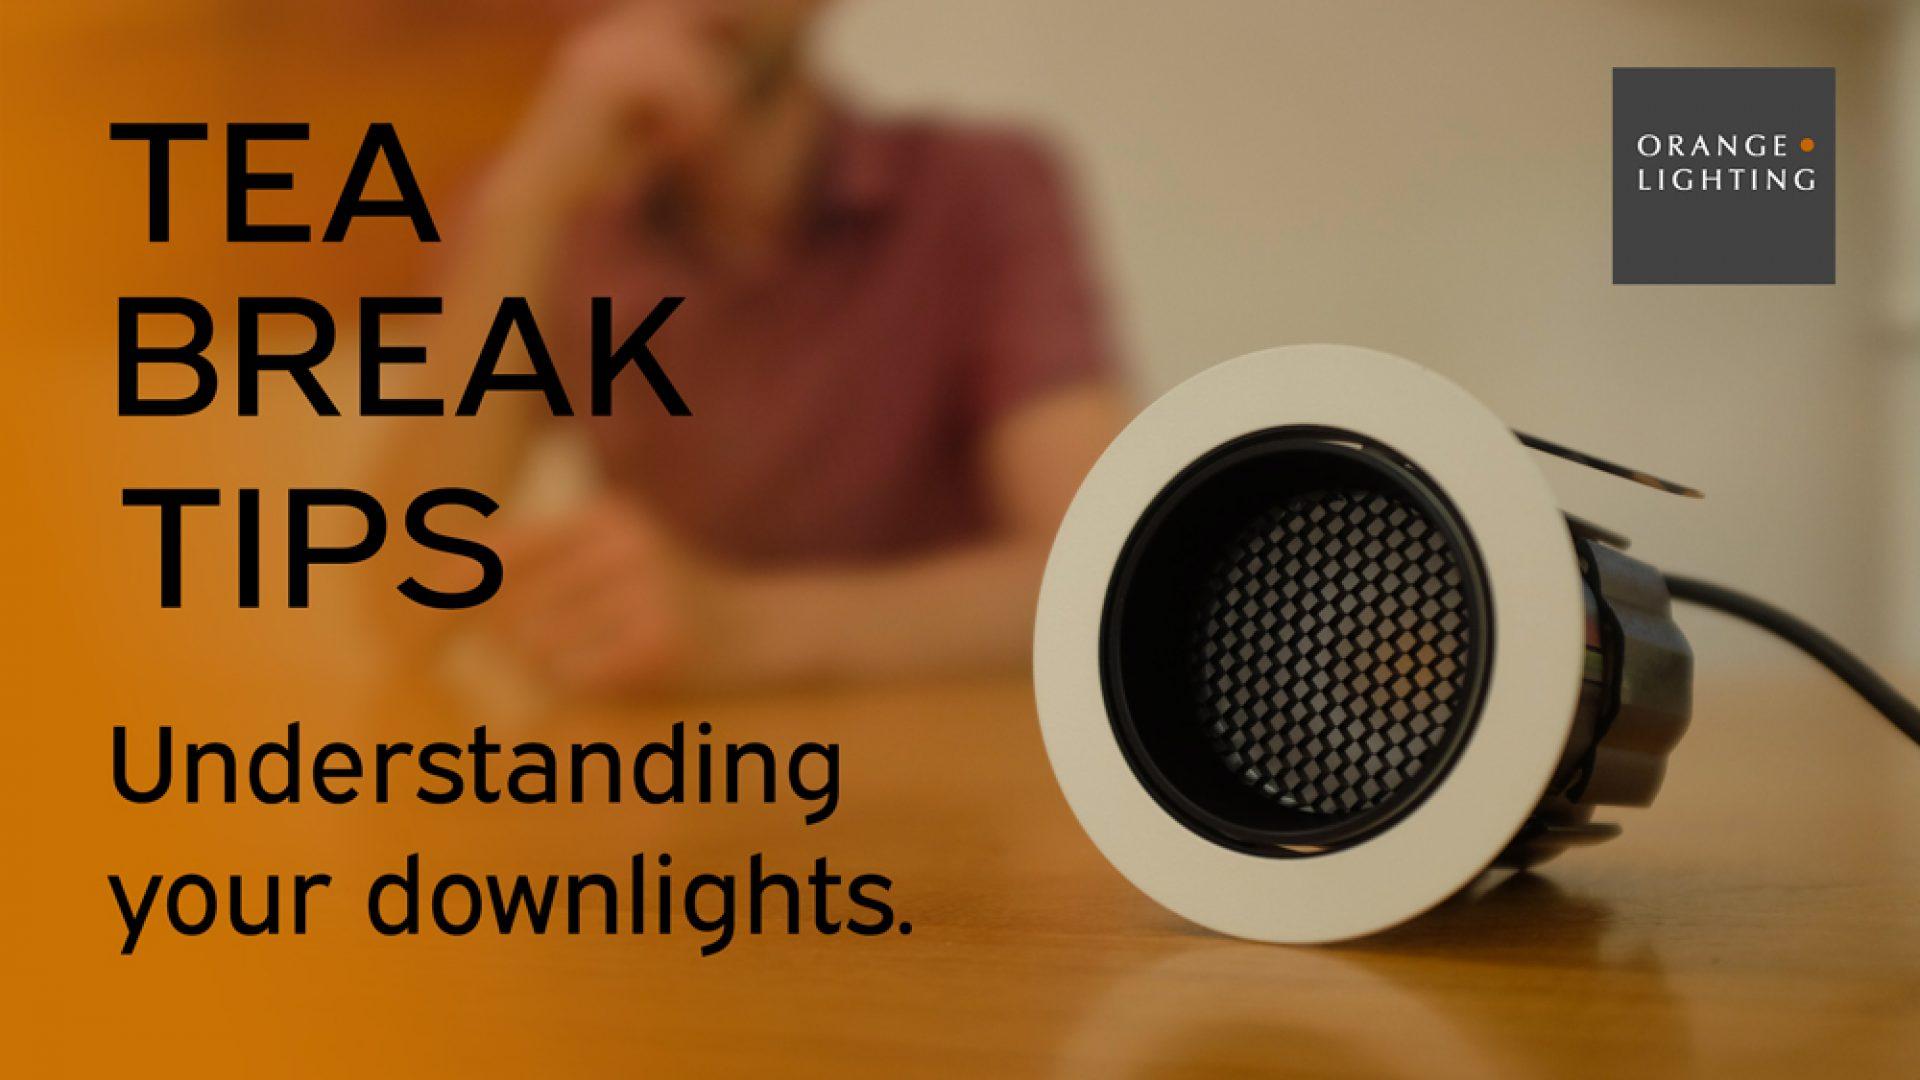 TBT-Downlights-Banner-Image